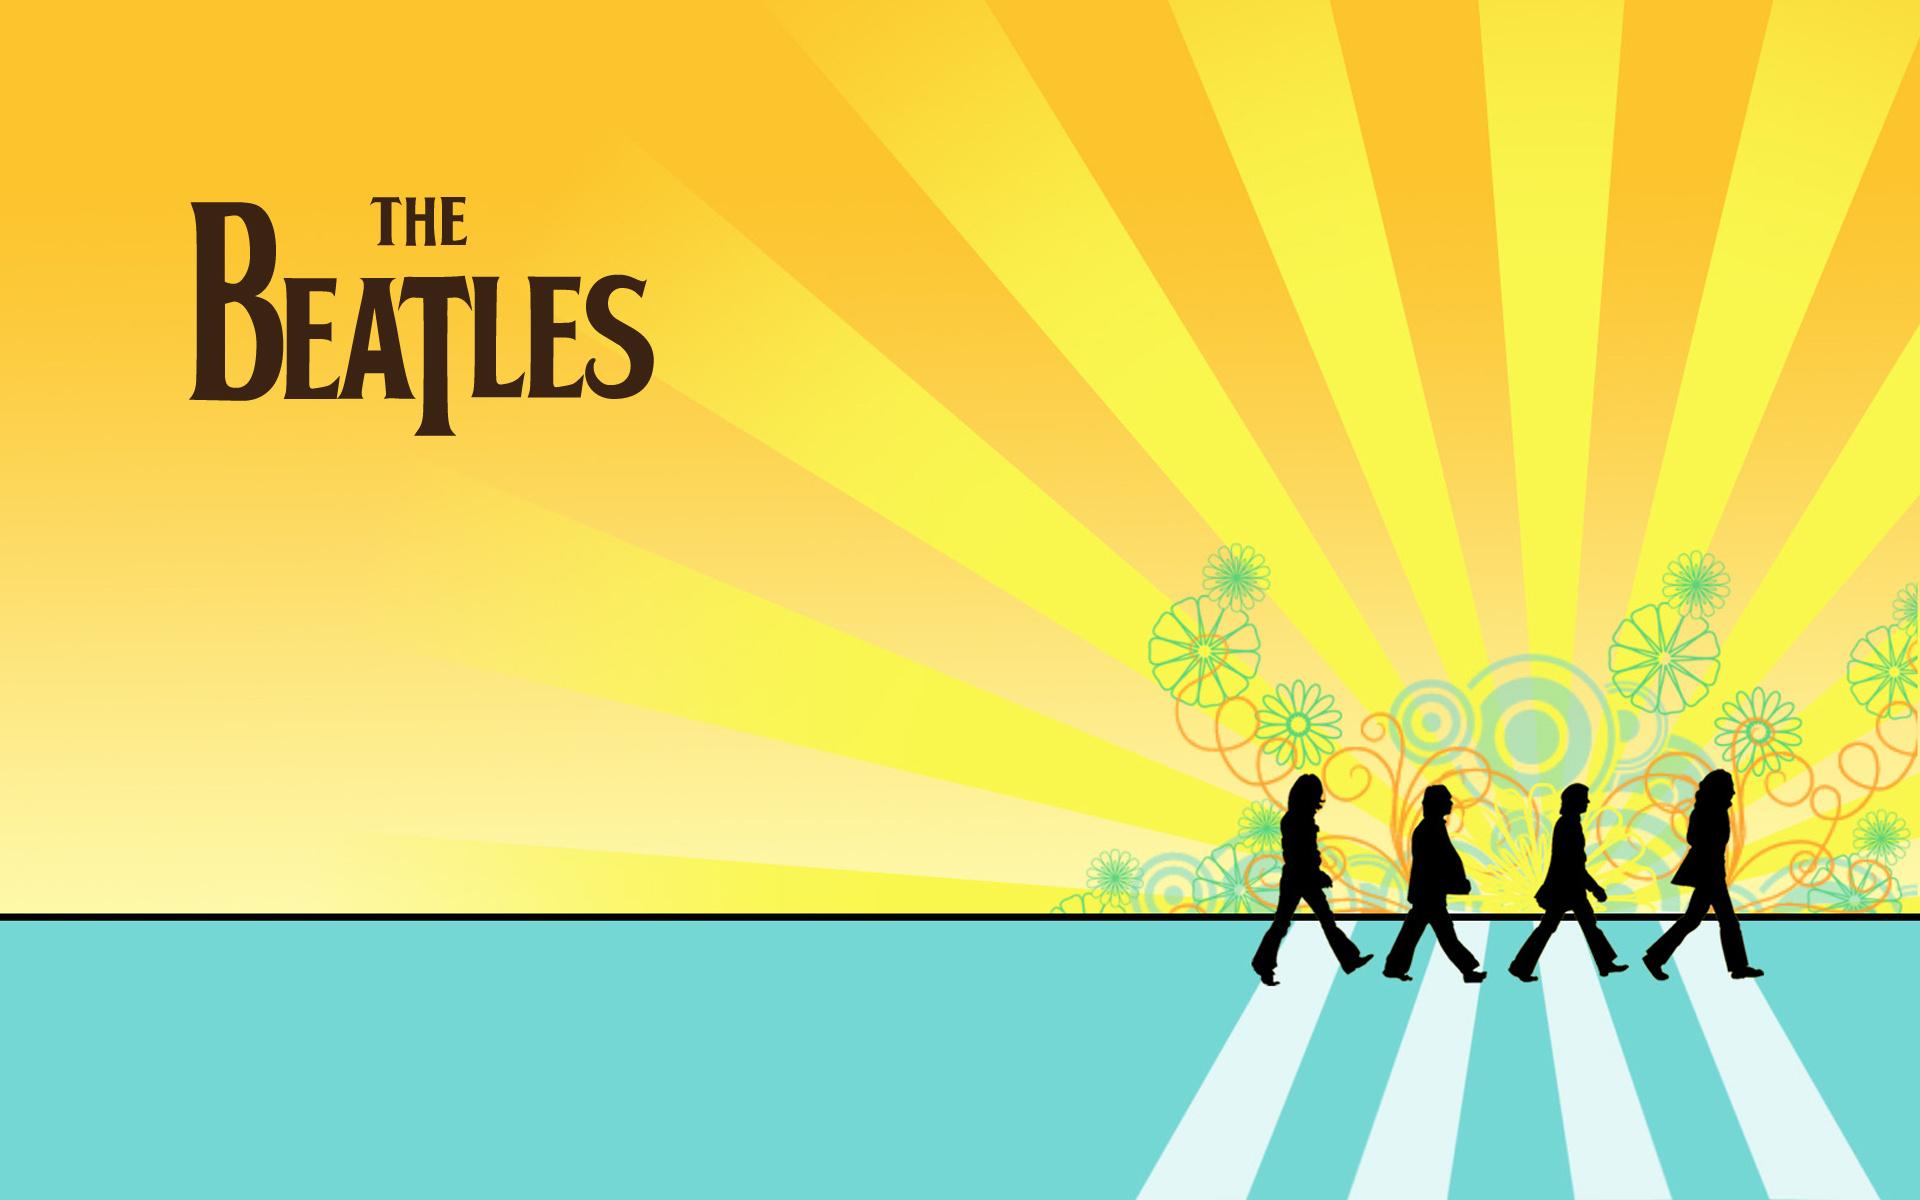 beatles free download music